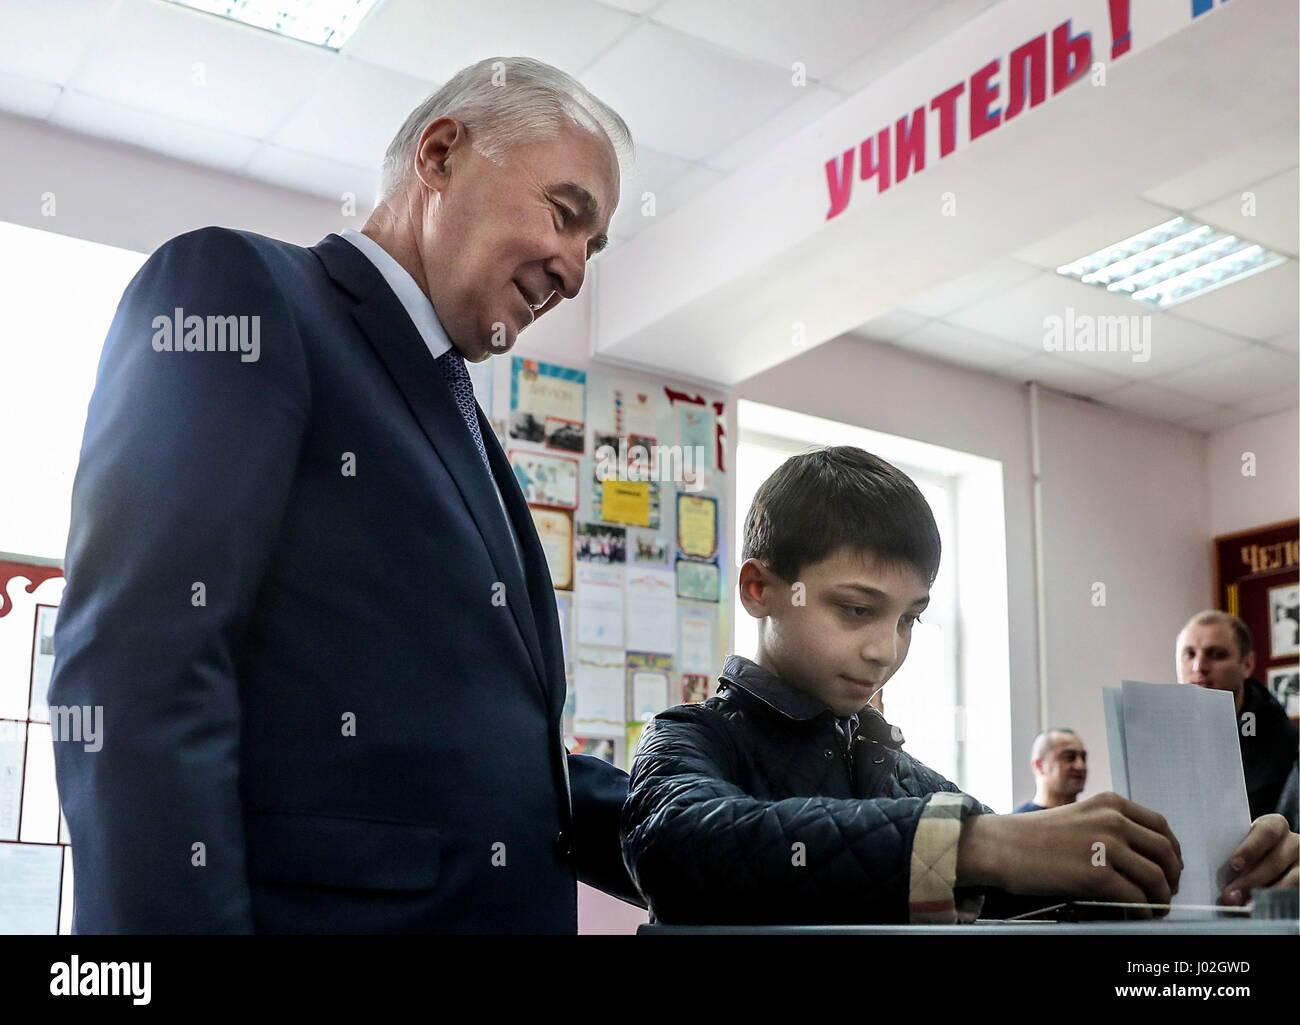 Tskhinval, South Ossetia. 9th Apr, 2017. South Ossetia's incumbent president Leonid Tibilov votes at the 2017 - Stock Image